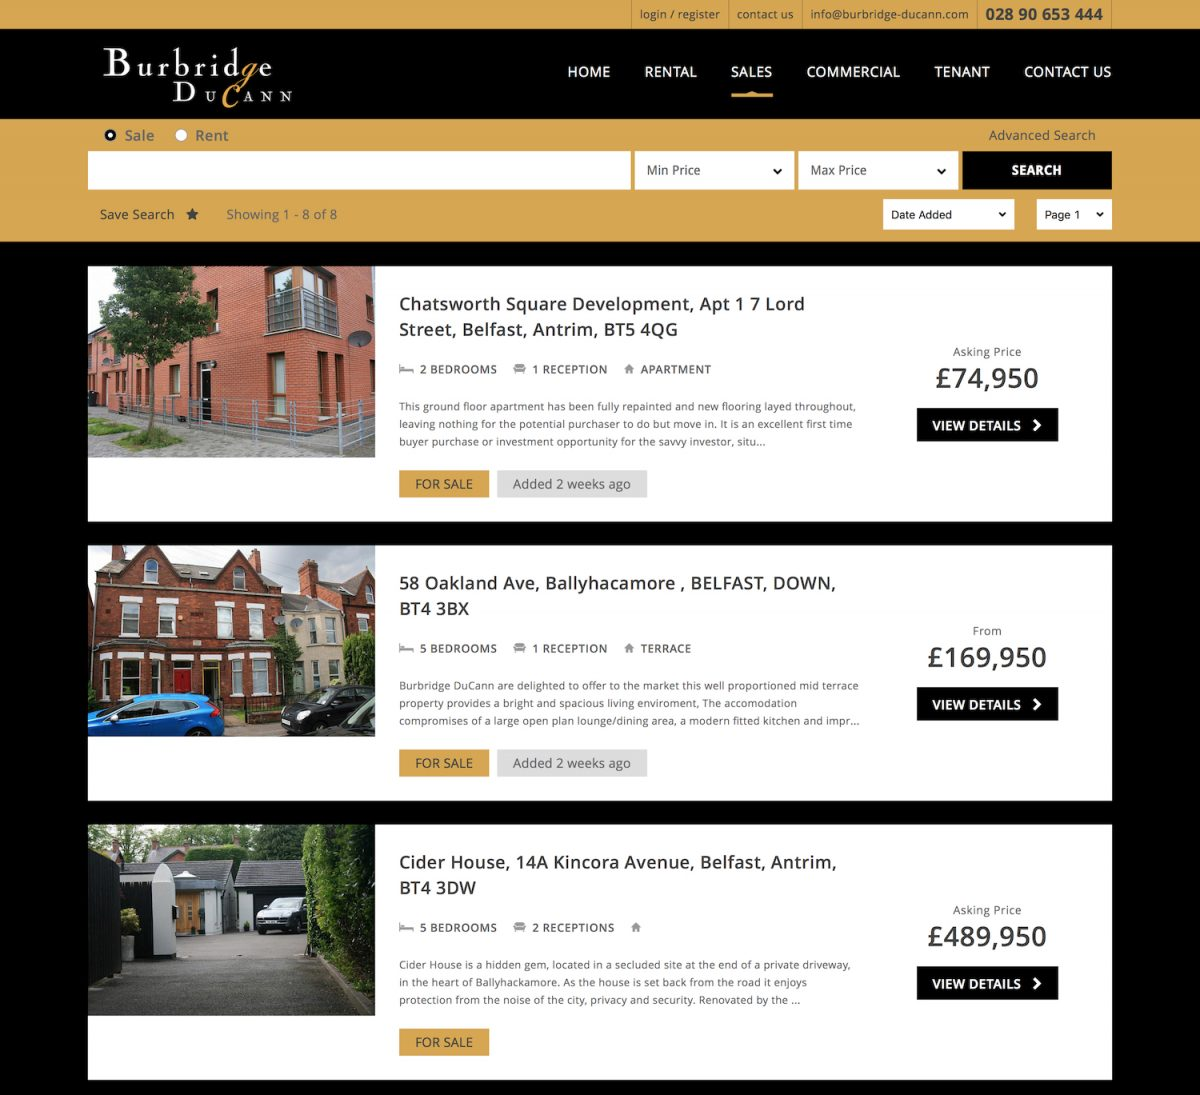 Properties for sale at Burbridge DuCann estate agents Northern Ireland 654